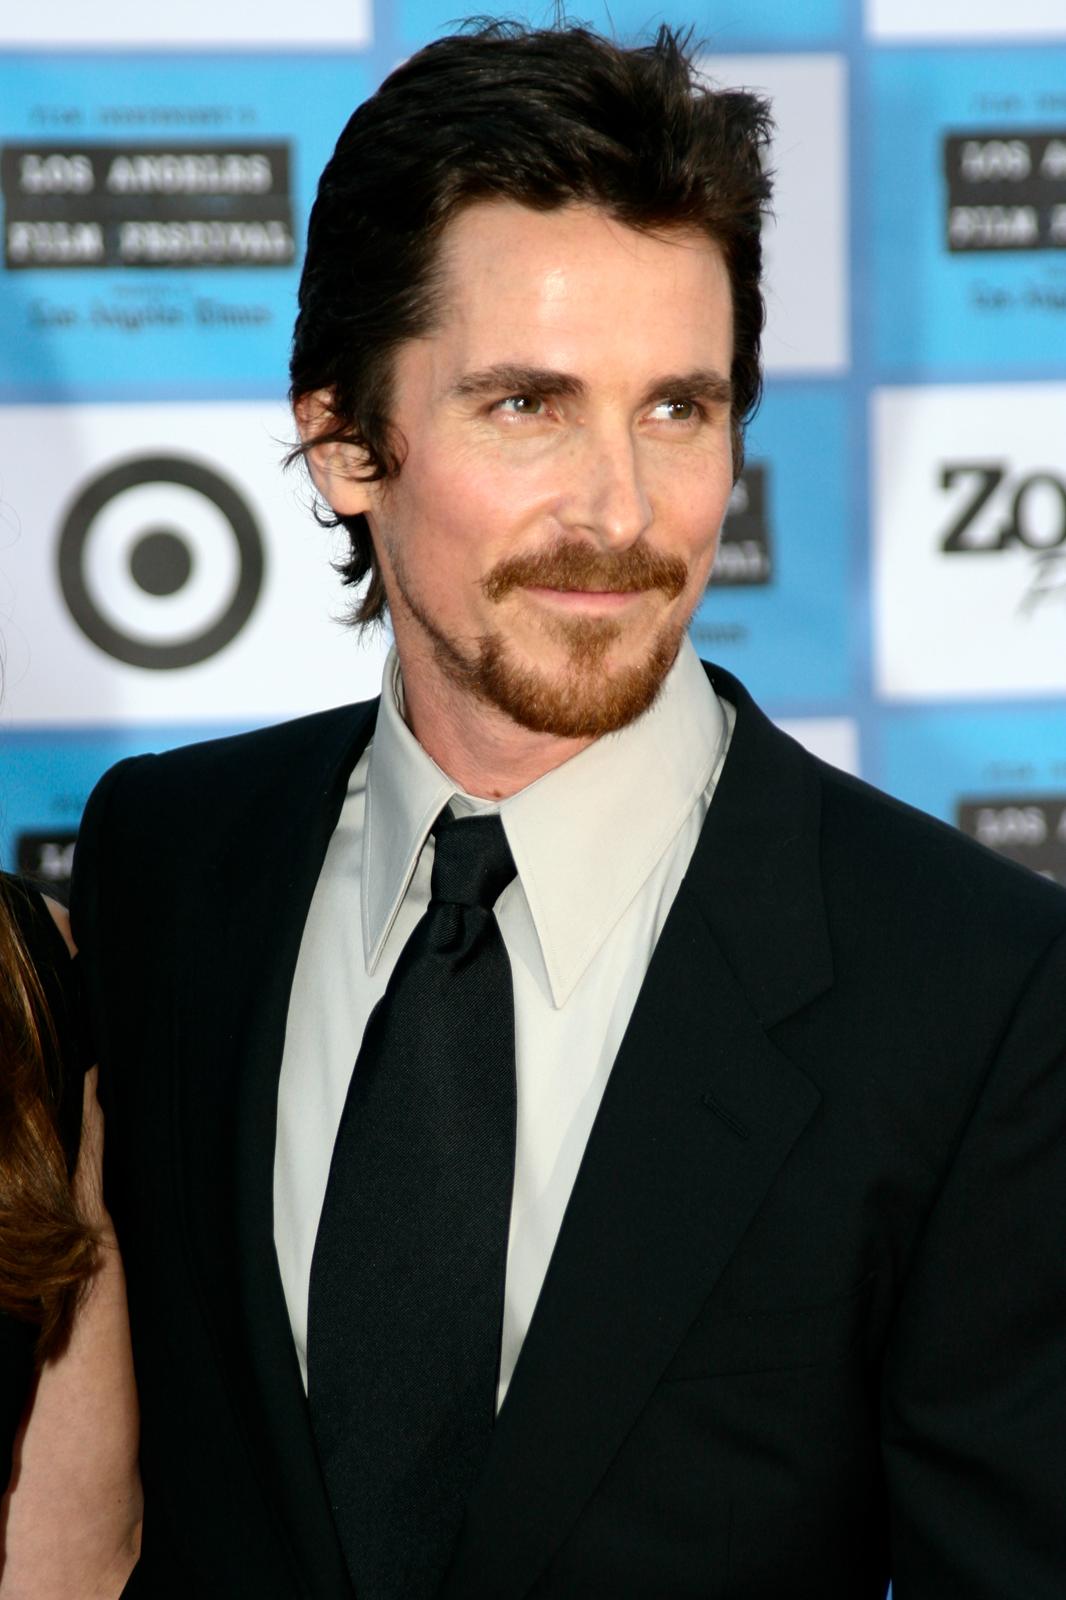 Christian Bale Pulls Out Of Enzo Ferrari Biopic Over ... Christian Bale